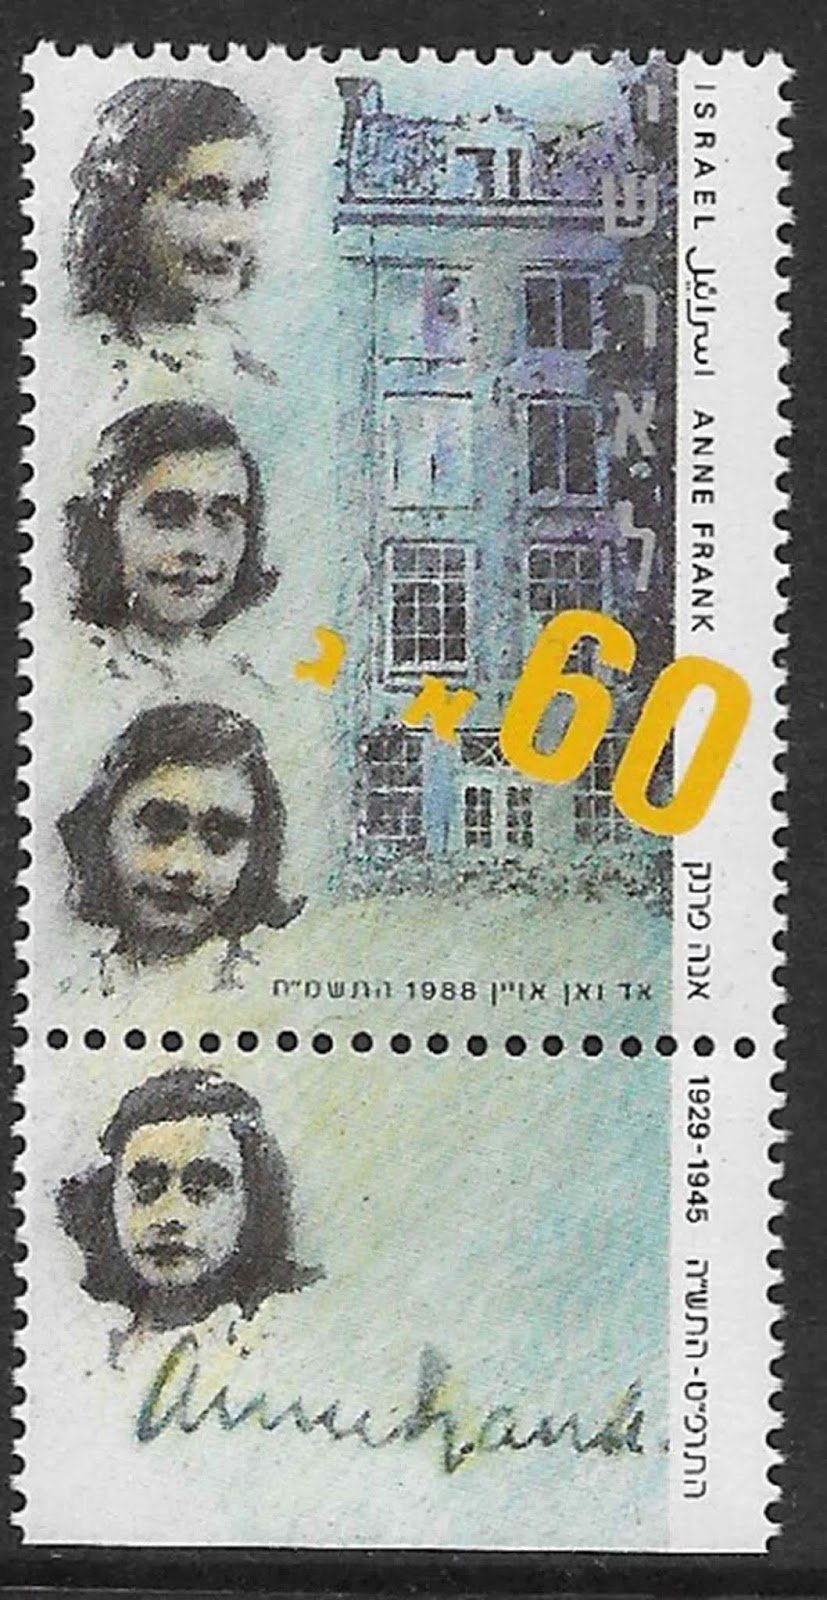 Anne Frank stamp, 1988.